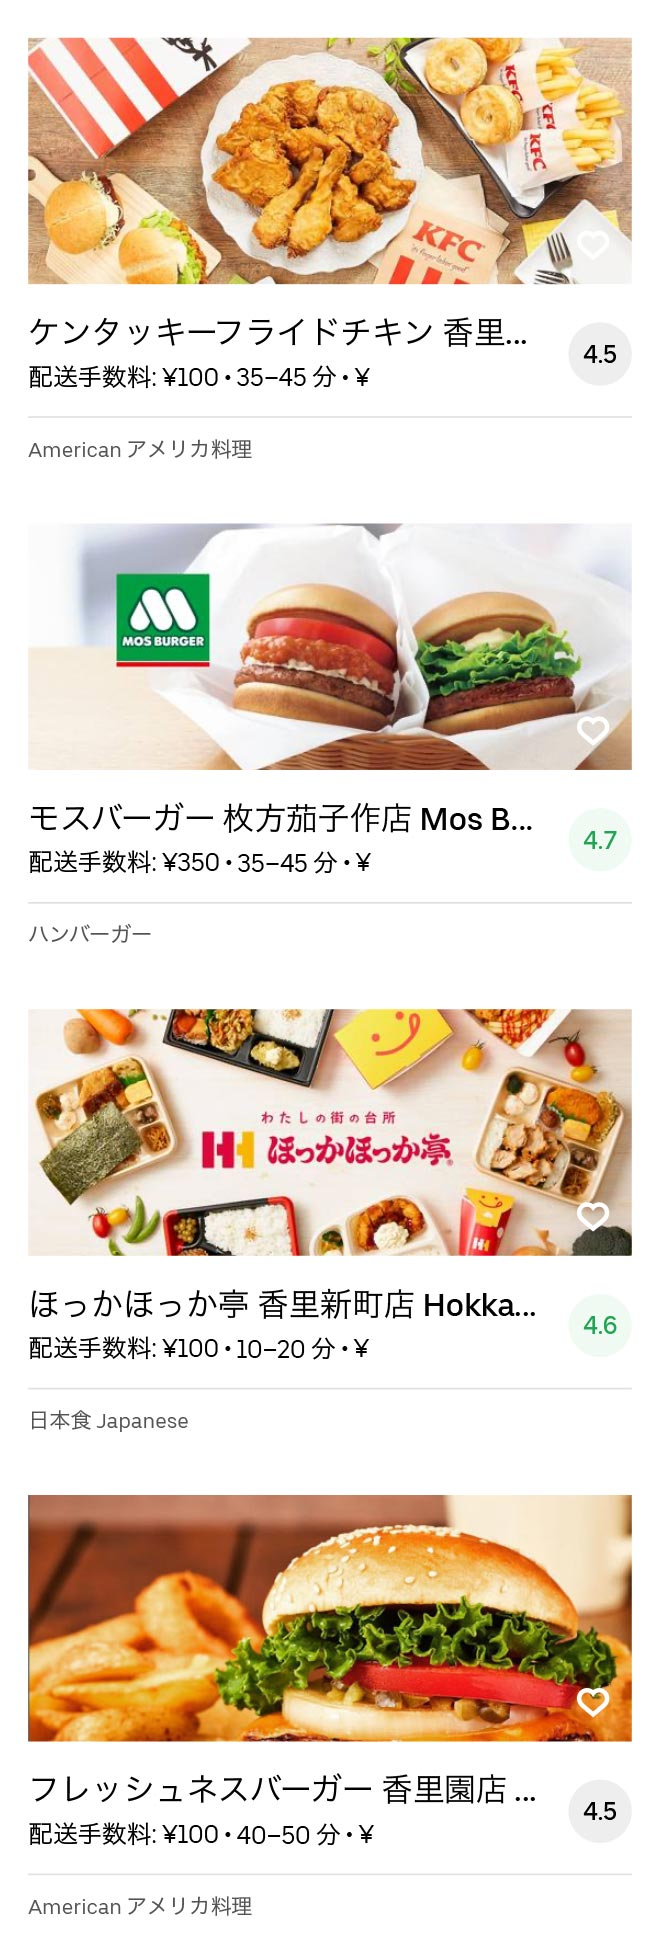 Neyagawa kourien menu 2006 03